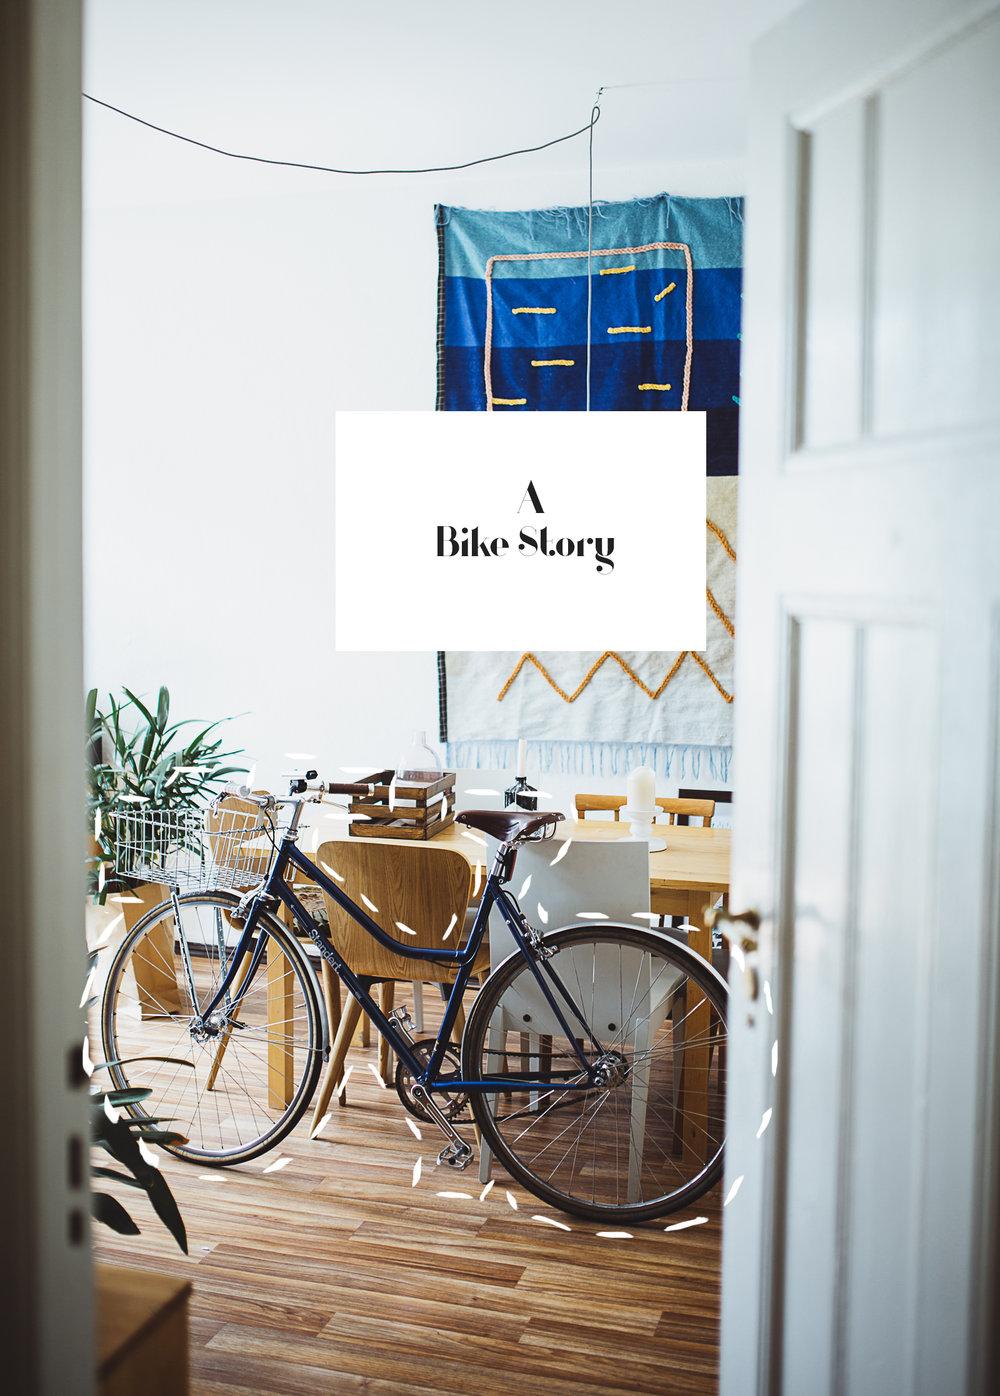 HERZ&BLUT x STANDERT - A Bike Story